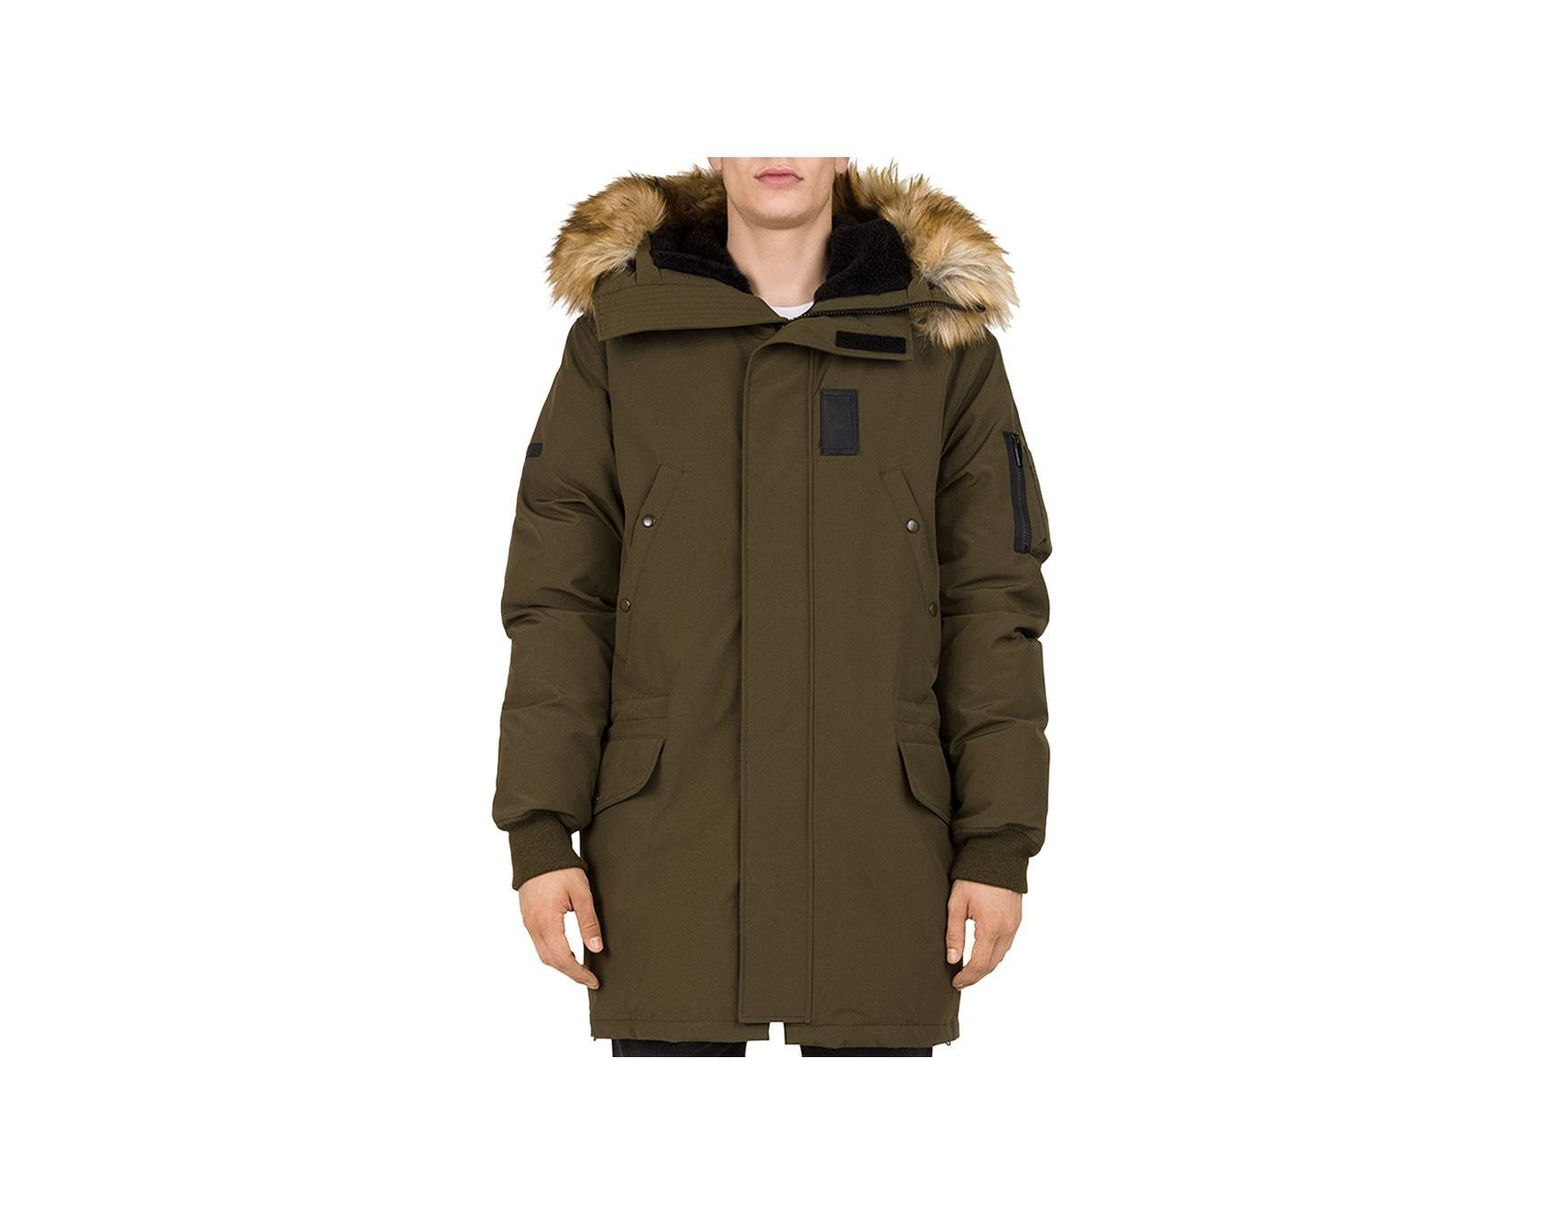 6a8ba6f8af The Kooples Mixed - Media Puffa Parka Jacket for Men - Lyst